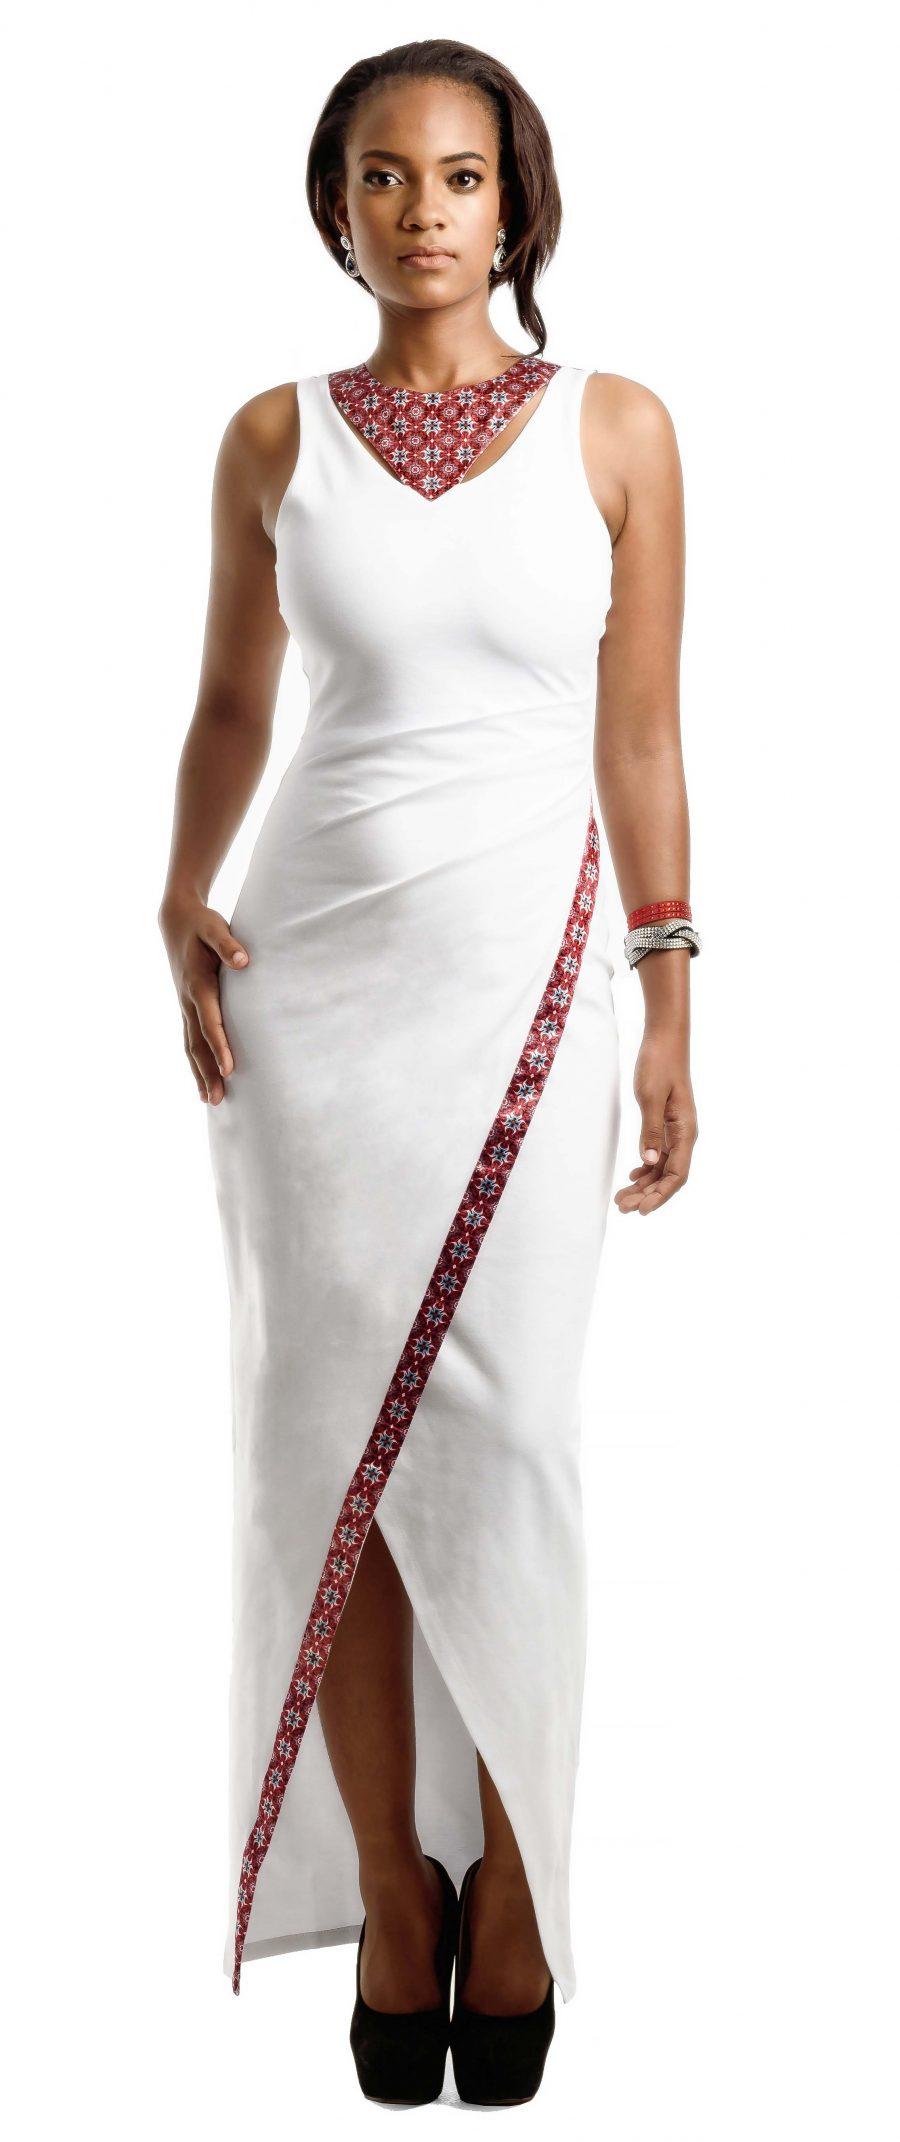 Latest ankara styles 2020 for ladies made of capulana, dutch wax print. Vestidos de capulana 2020, Vestidos de capulana iris santos Unique ankara dresses. Moda 2020 fashion trends.